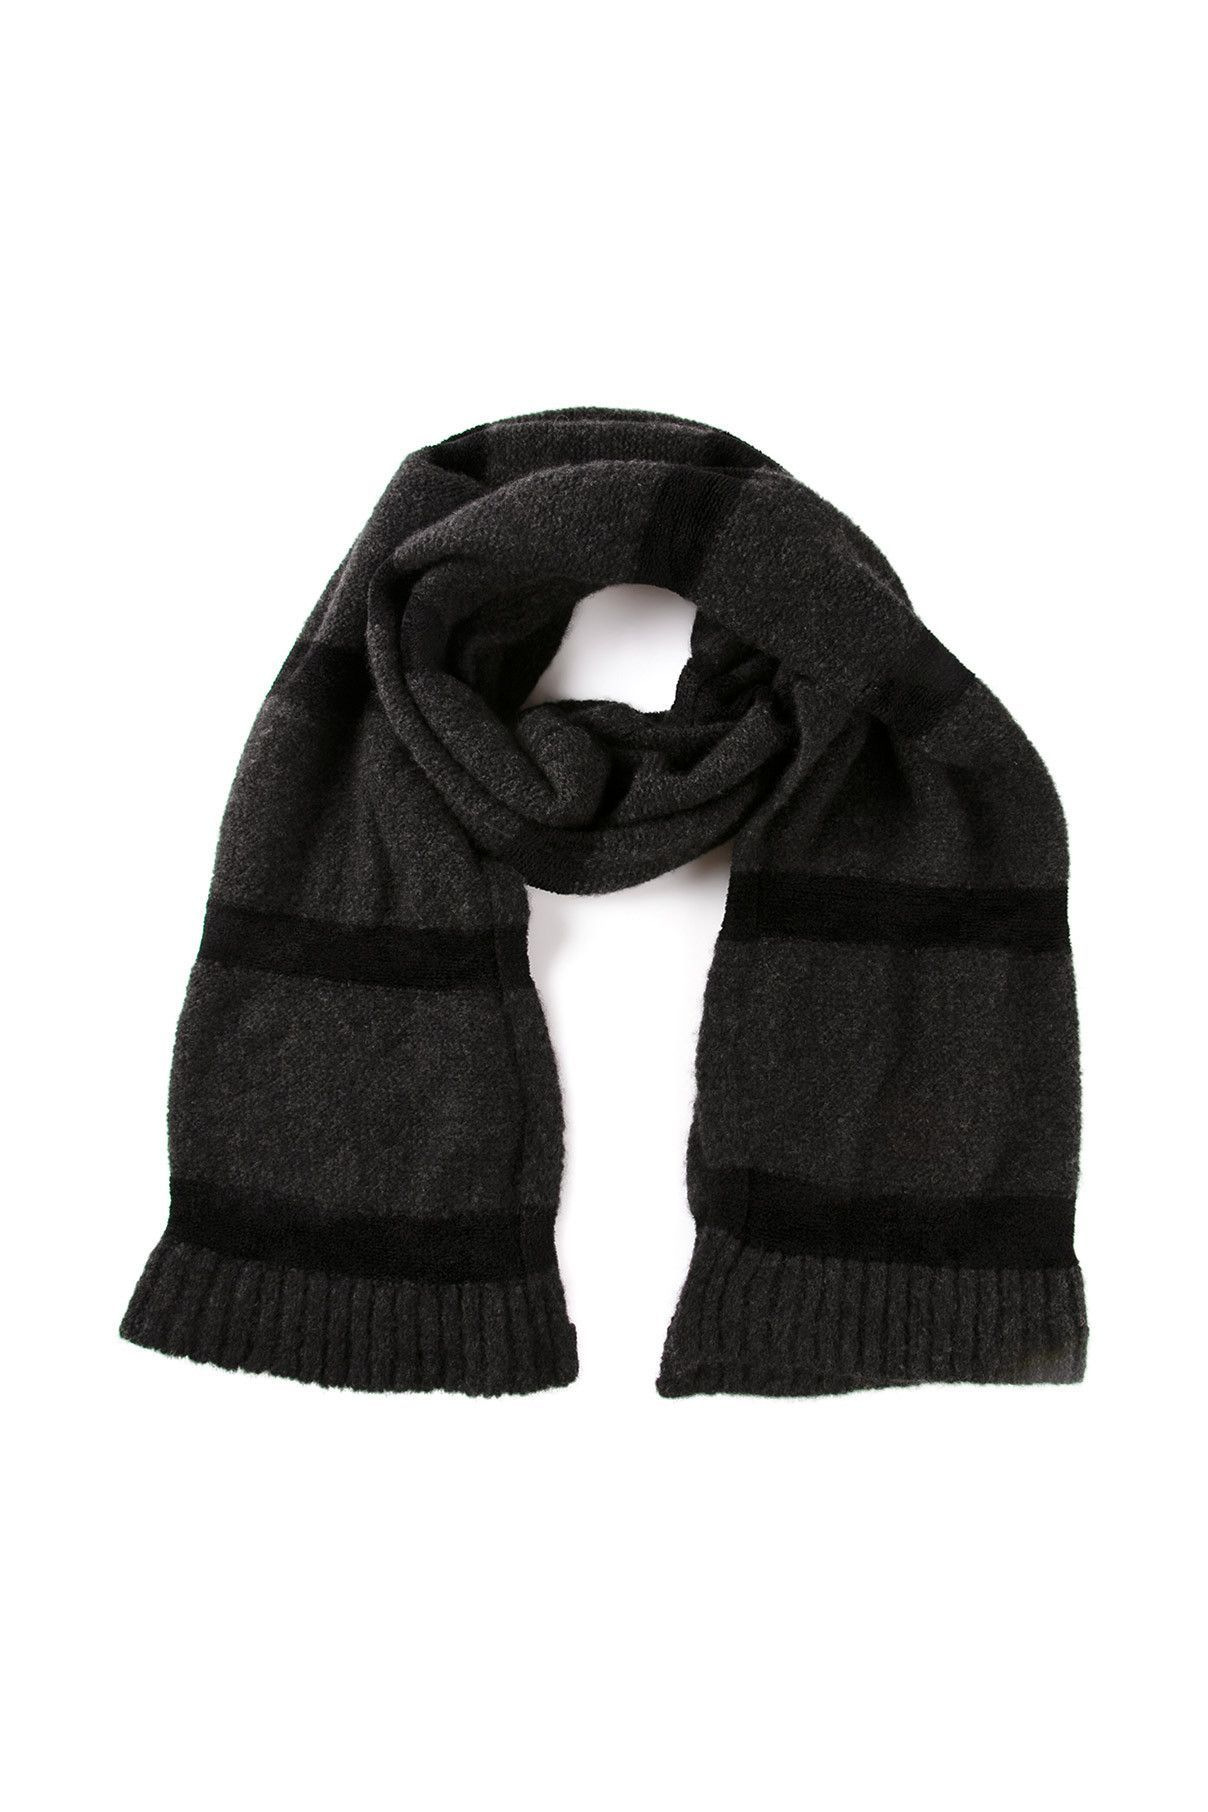 {Faliero Sarti / 05 accessory / 02 scarf} Now Stripe Scarf